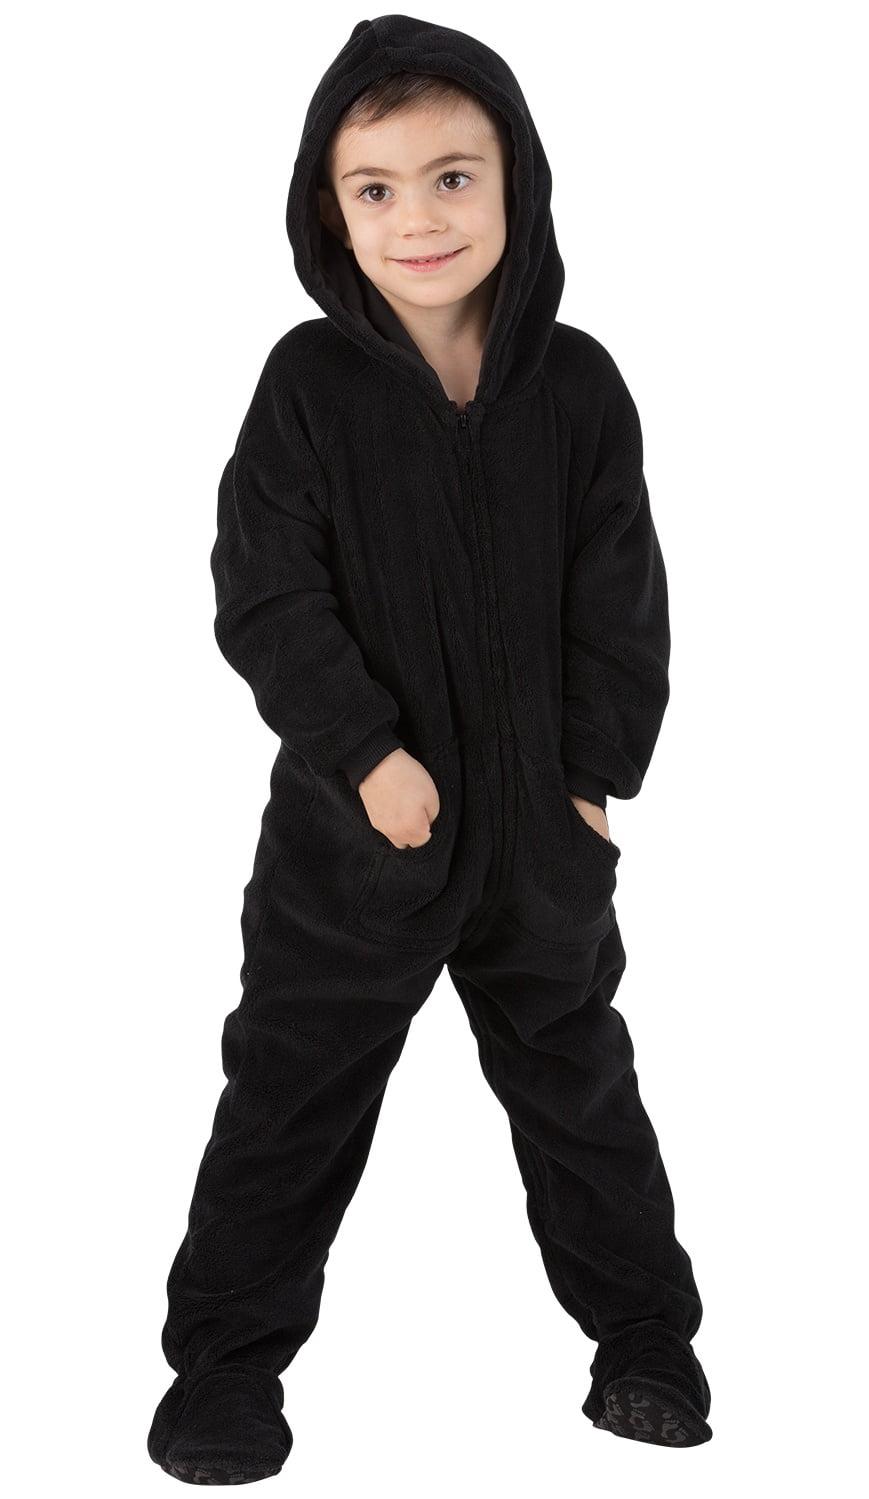 0239c13f3 Footed Pajamas - Footed Pajamas - Jet Black Toddler Hoodie Chenille ...